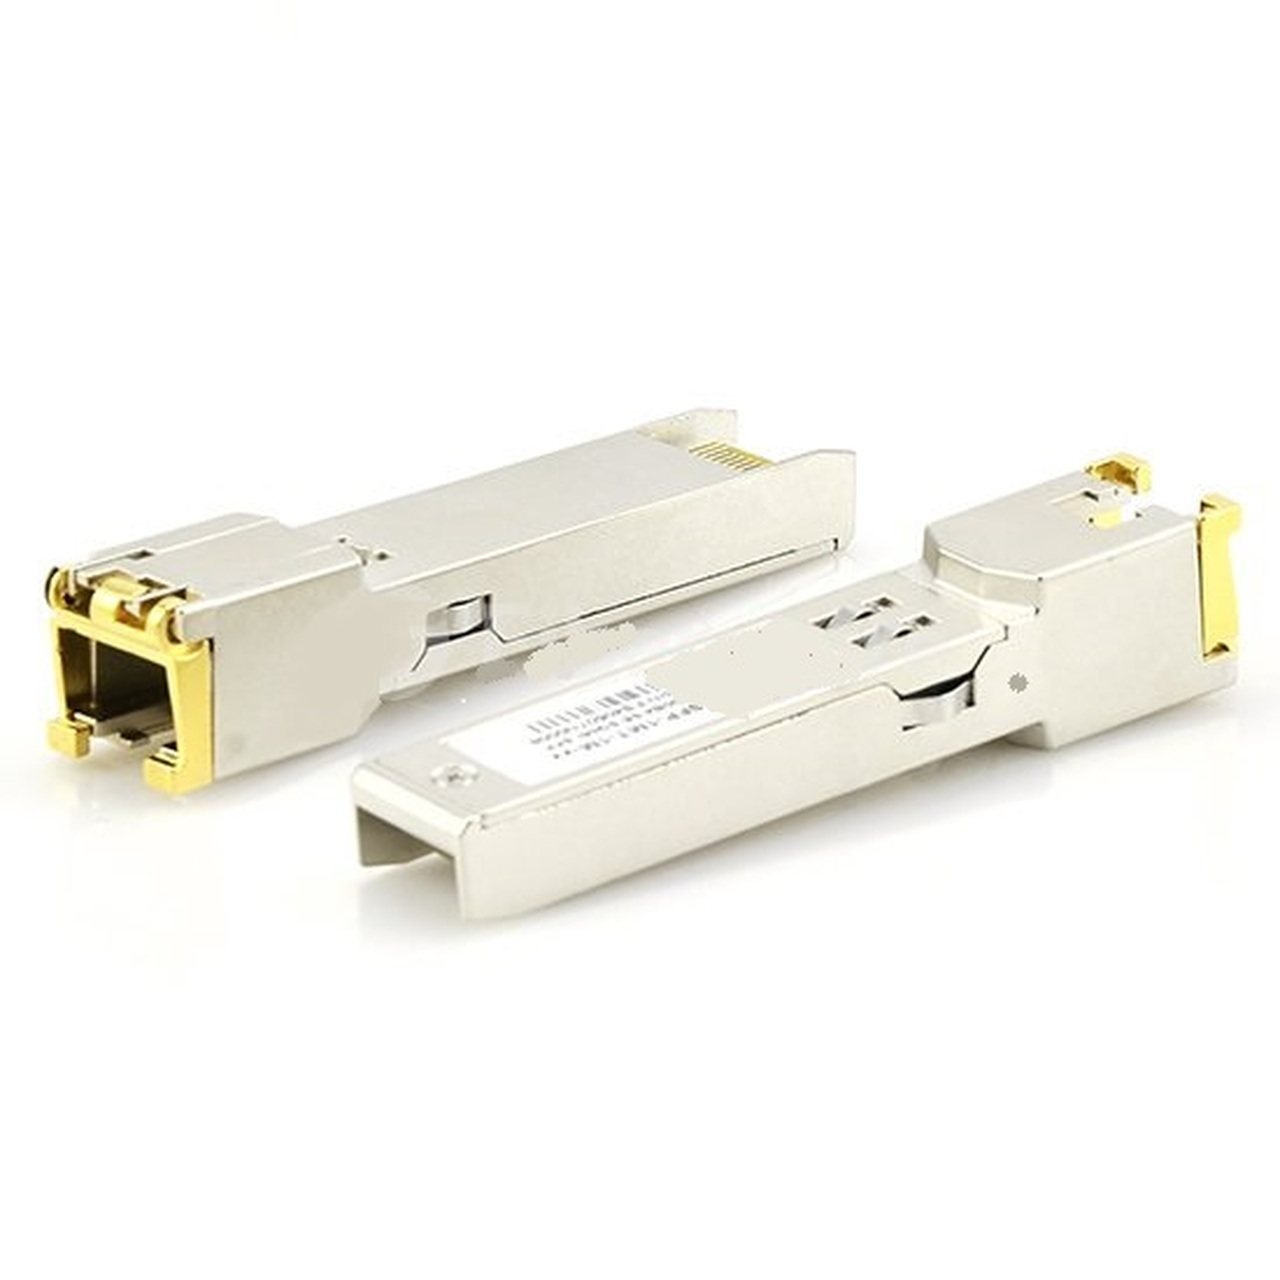 For Cisco New GLC-T 1000Base-T SFP Transceiver module RJ-45 Copper